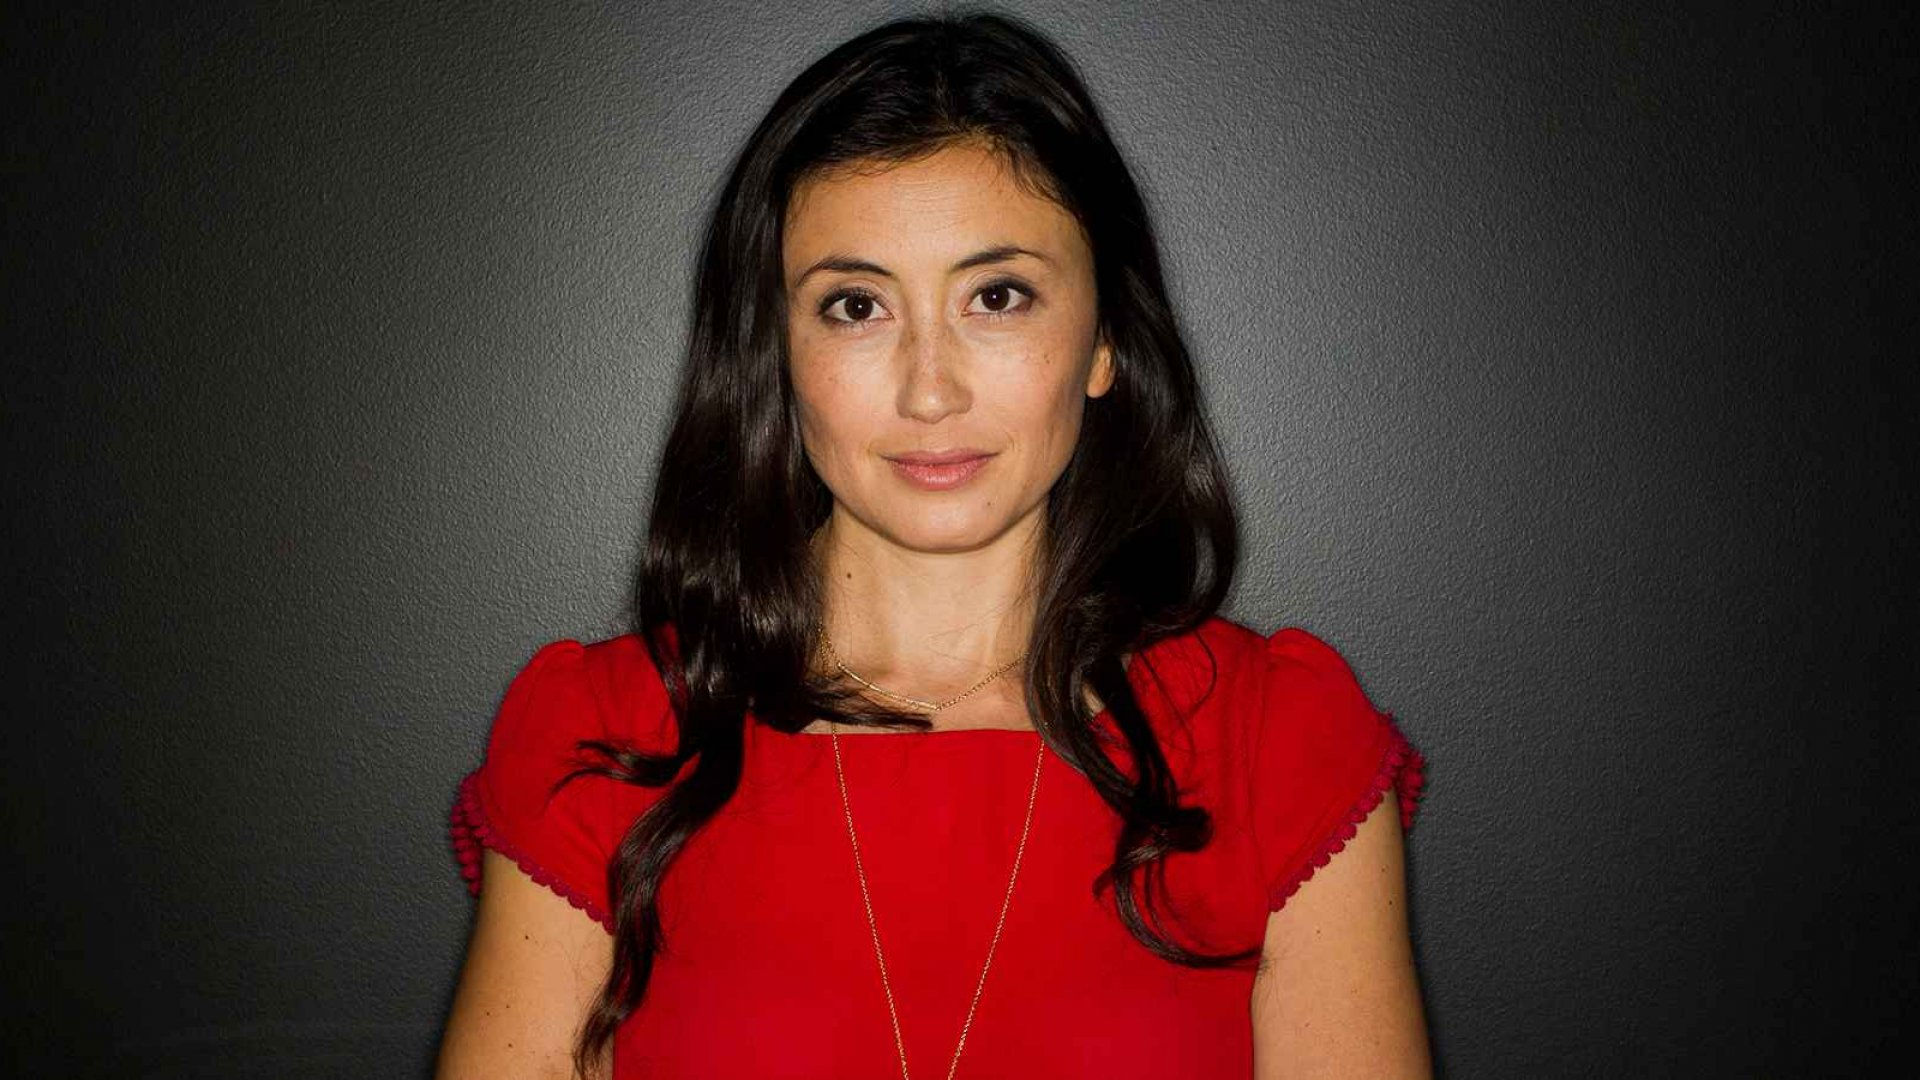 Stitch Fix CEO Katrina Lake.